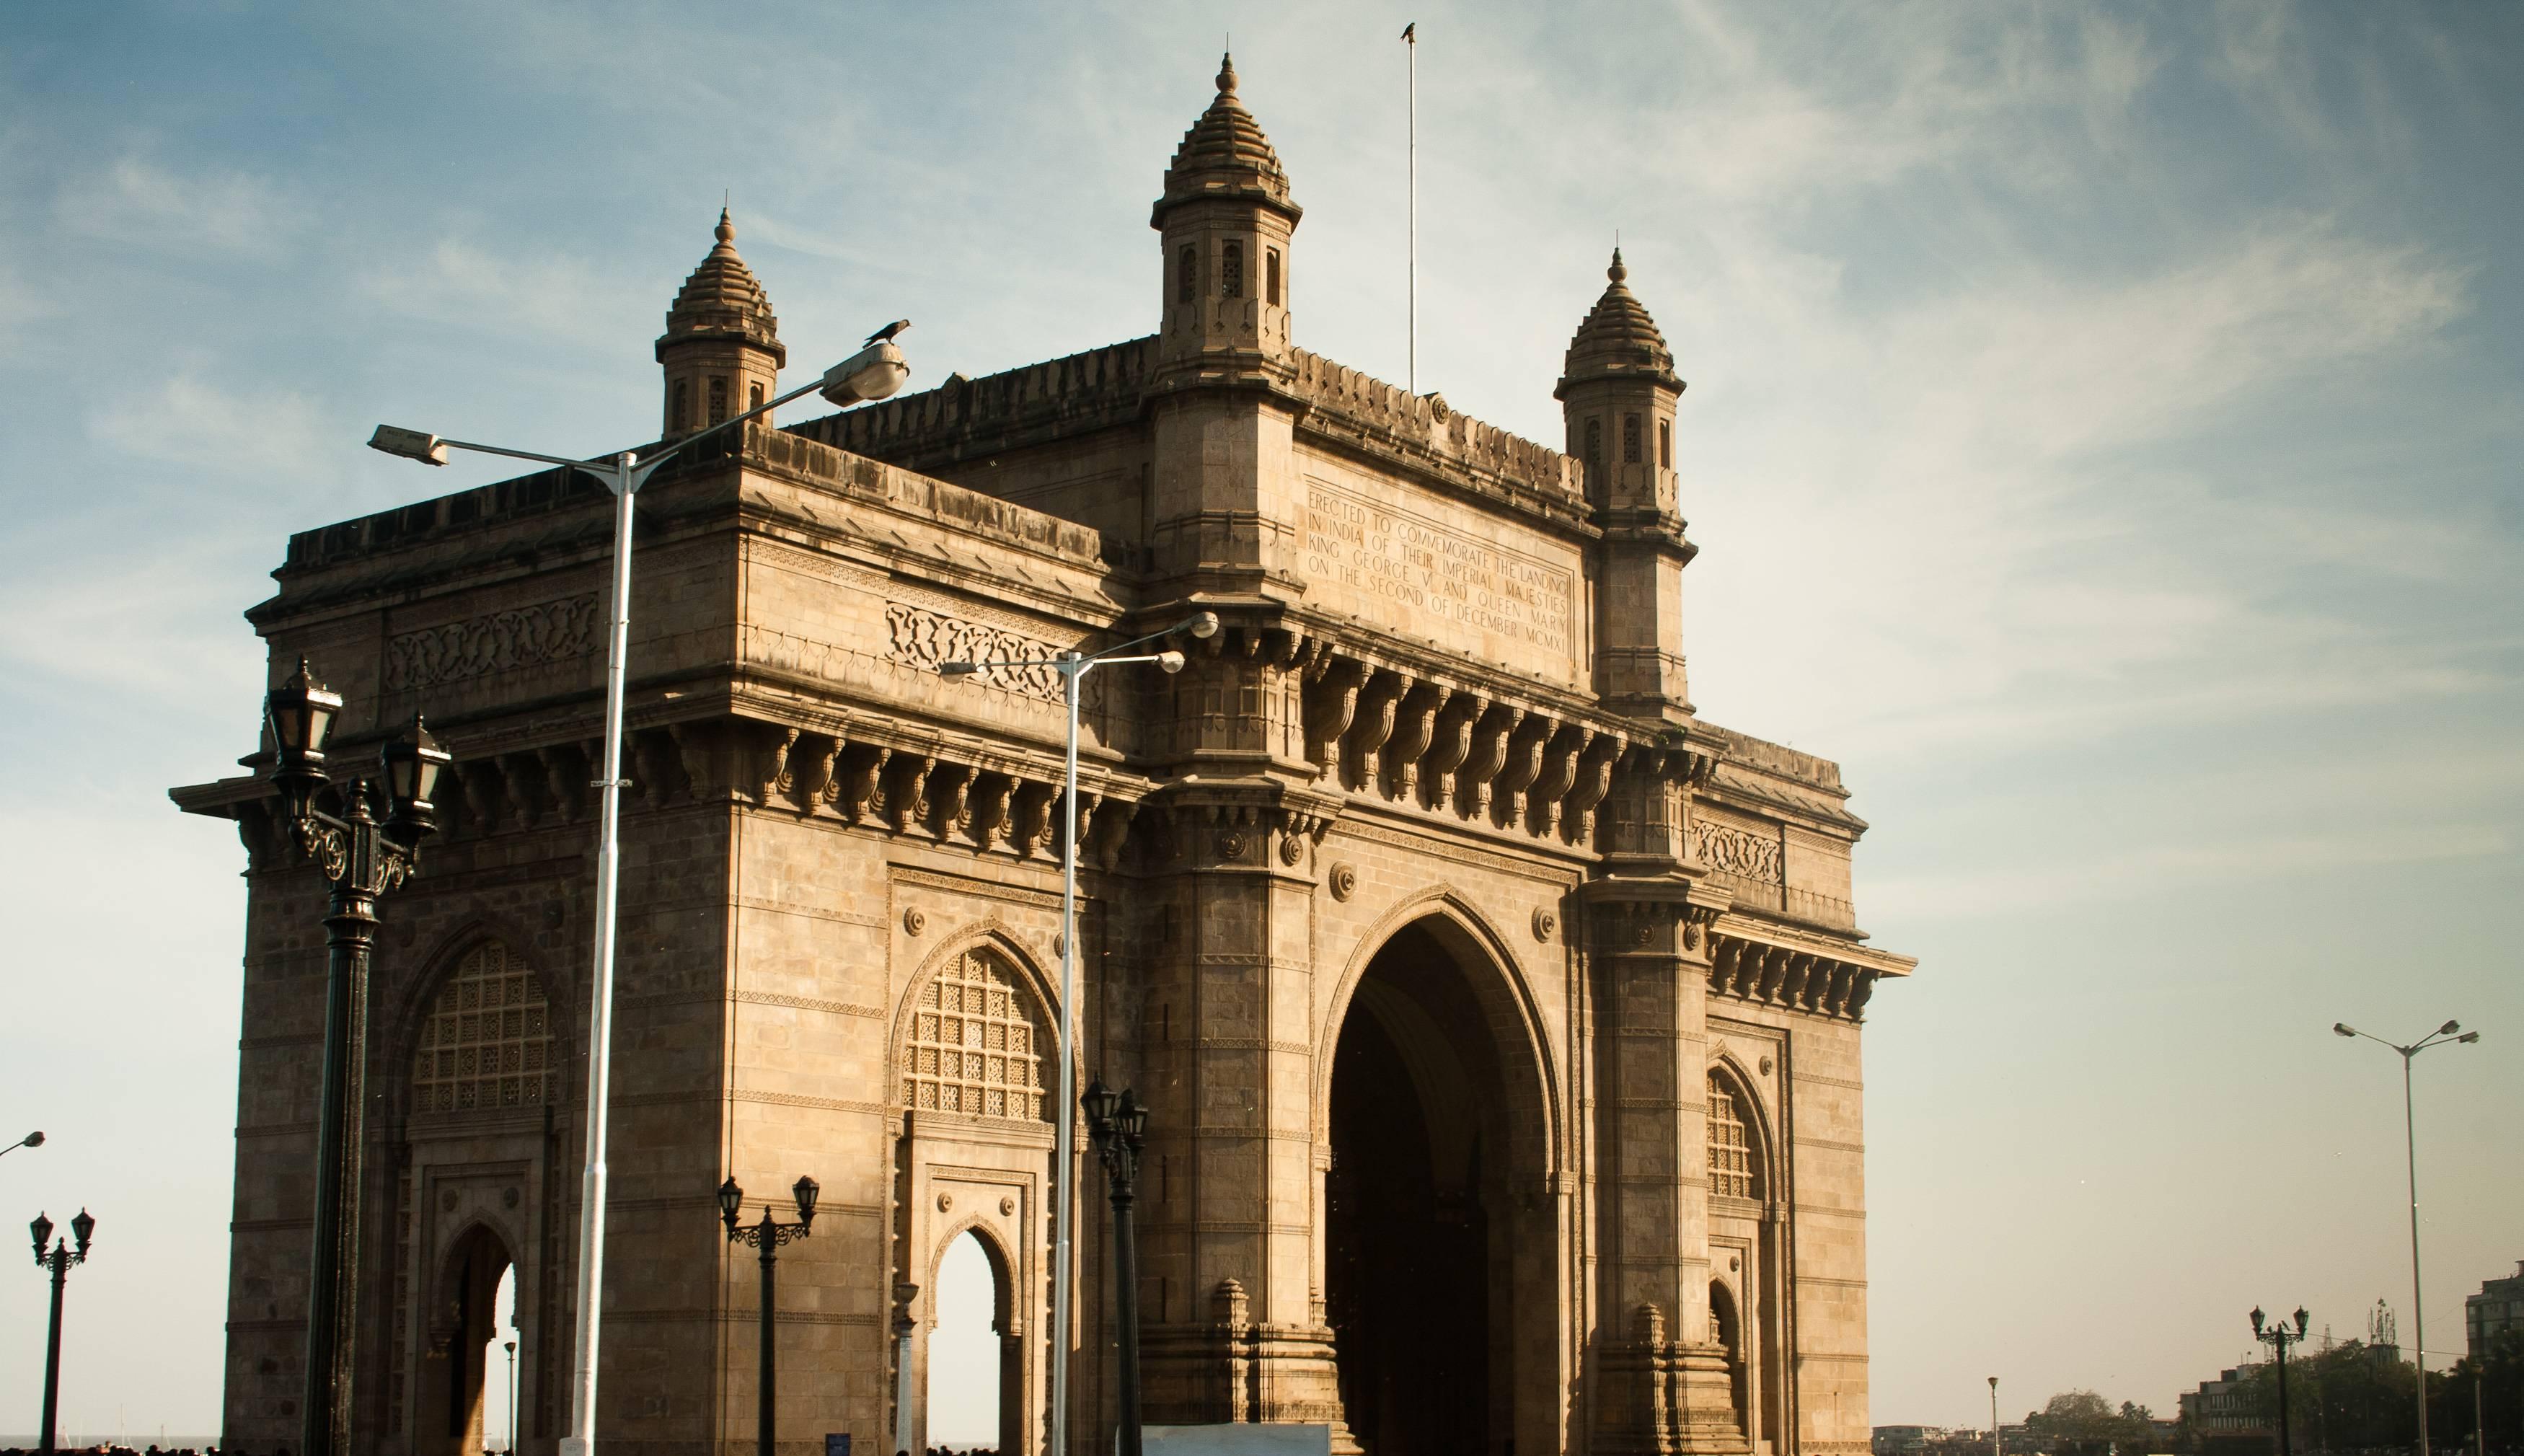 gateway of india mumbai - photo #16